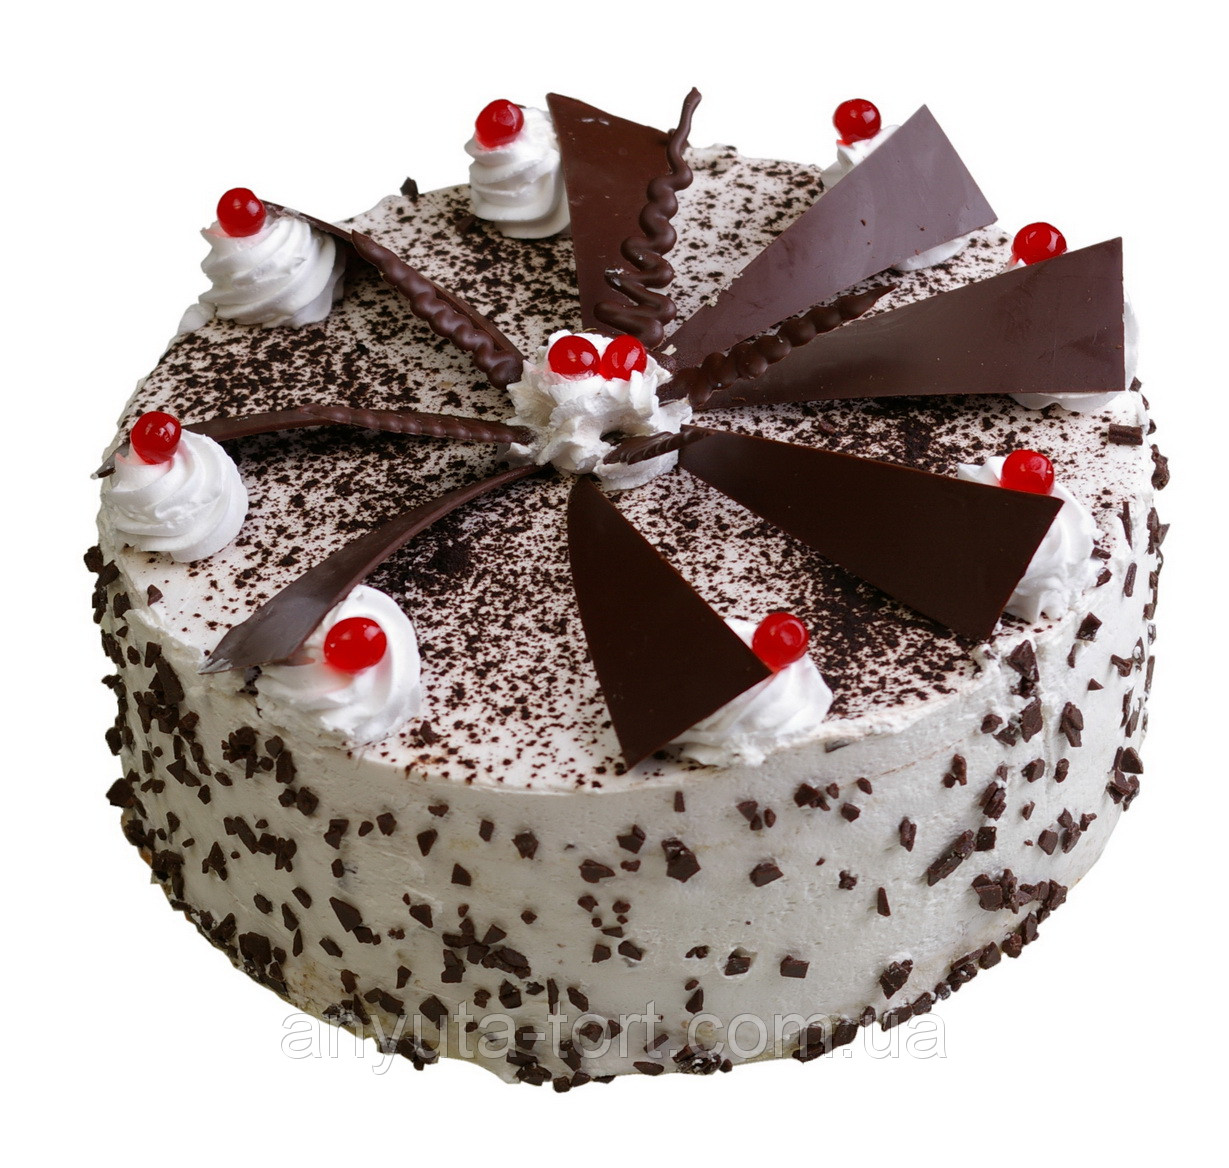 Черный лес торт на заказ